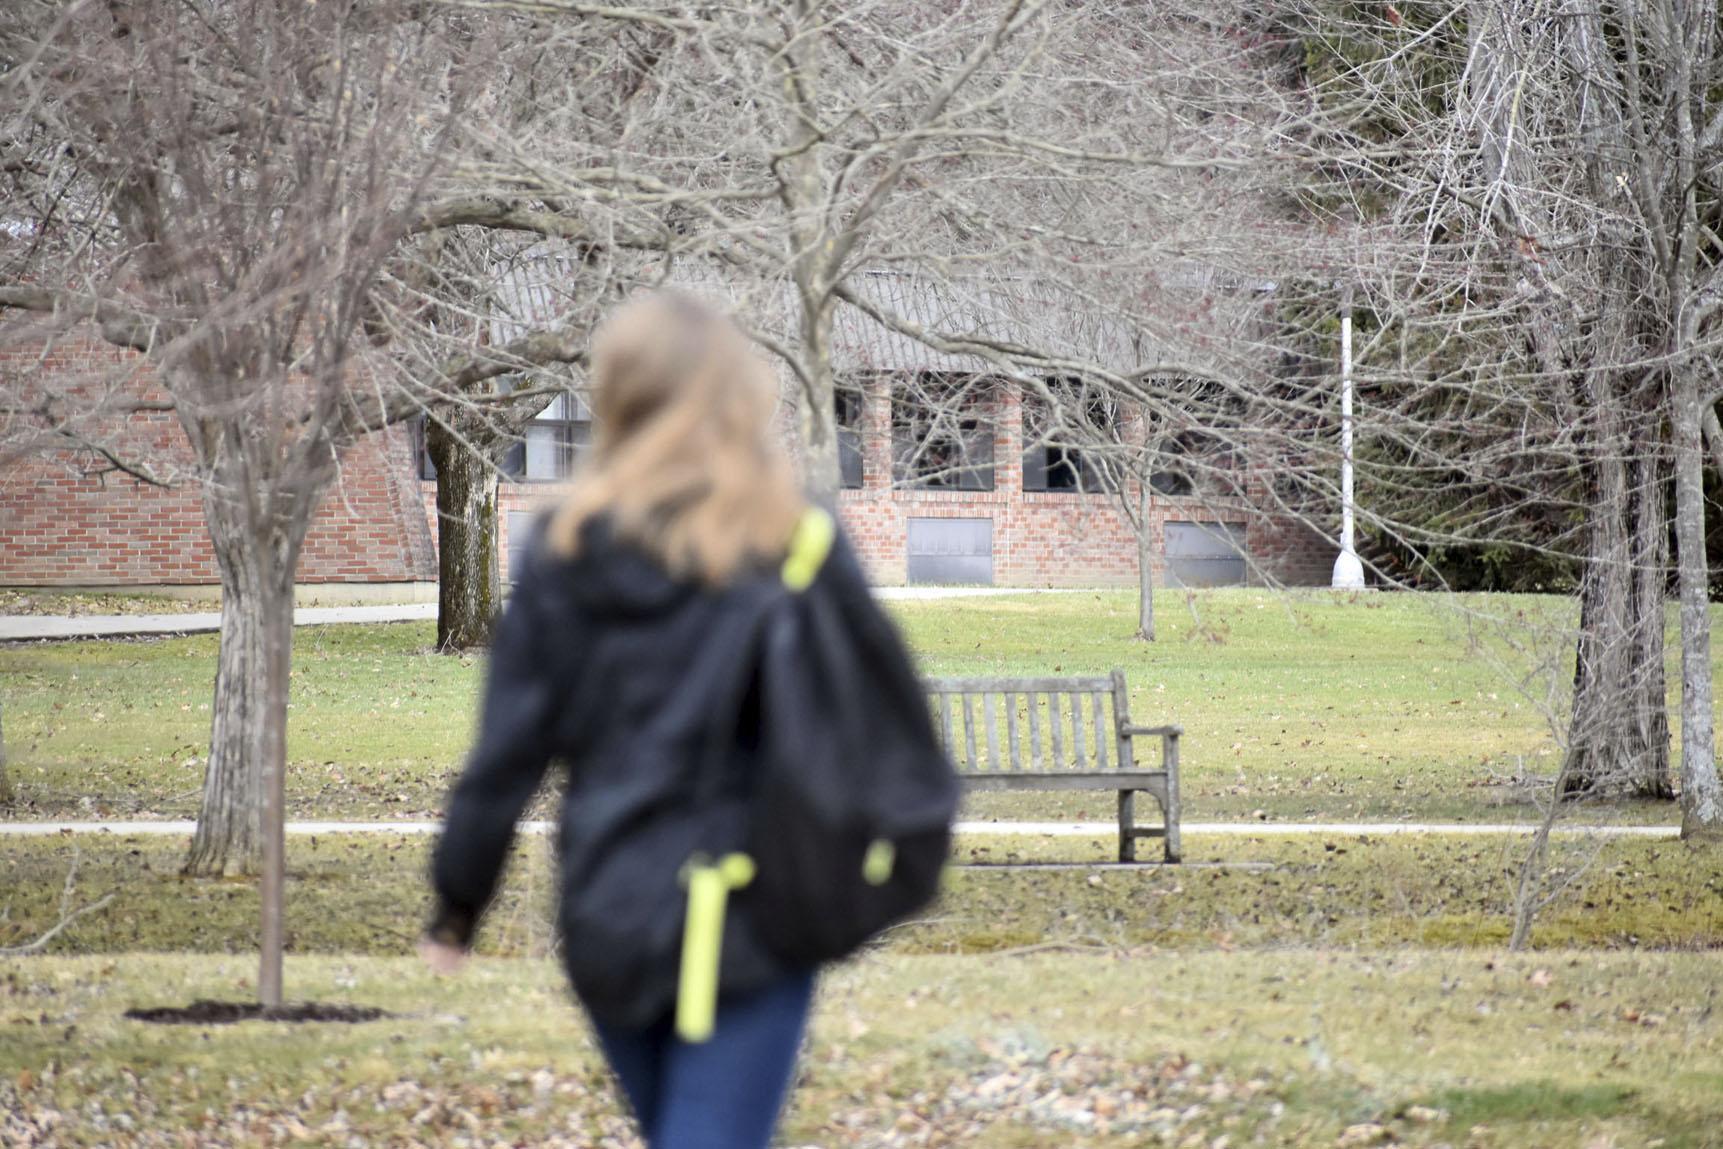 Jcc Preparing For Online Life   News, Sports, Jobs – Observer For When Is Spring Break For Suffolk Community College